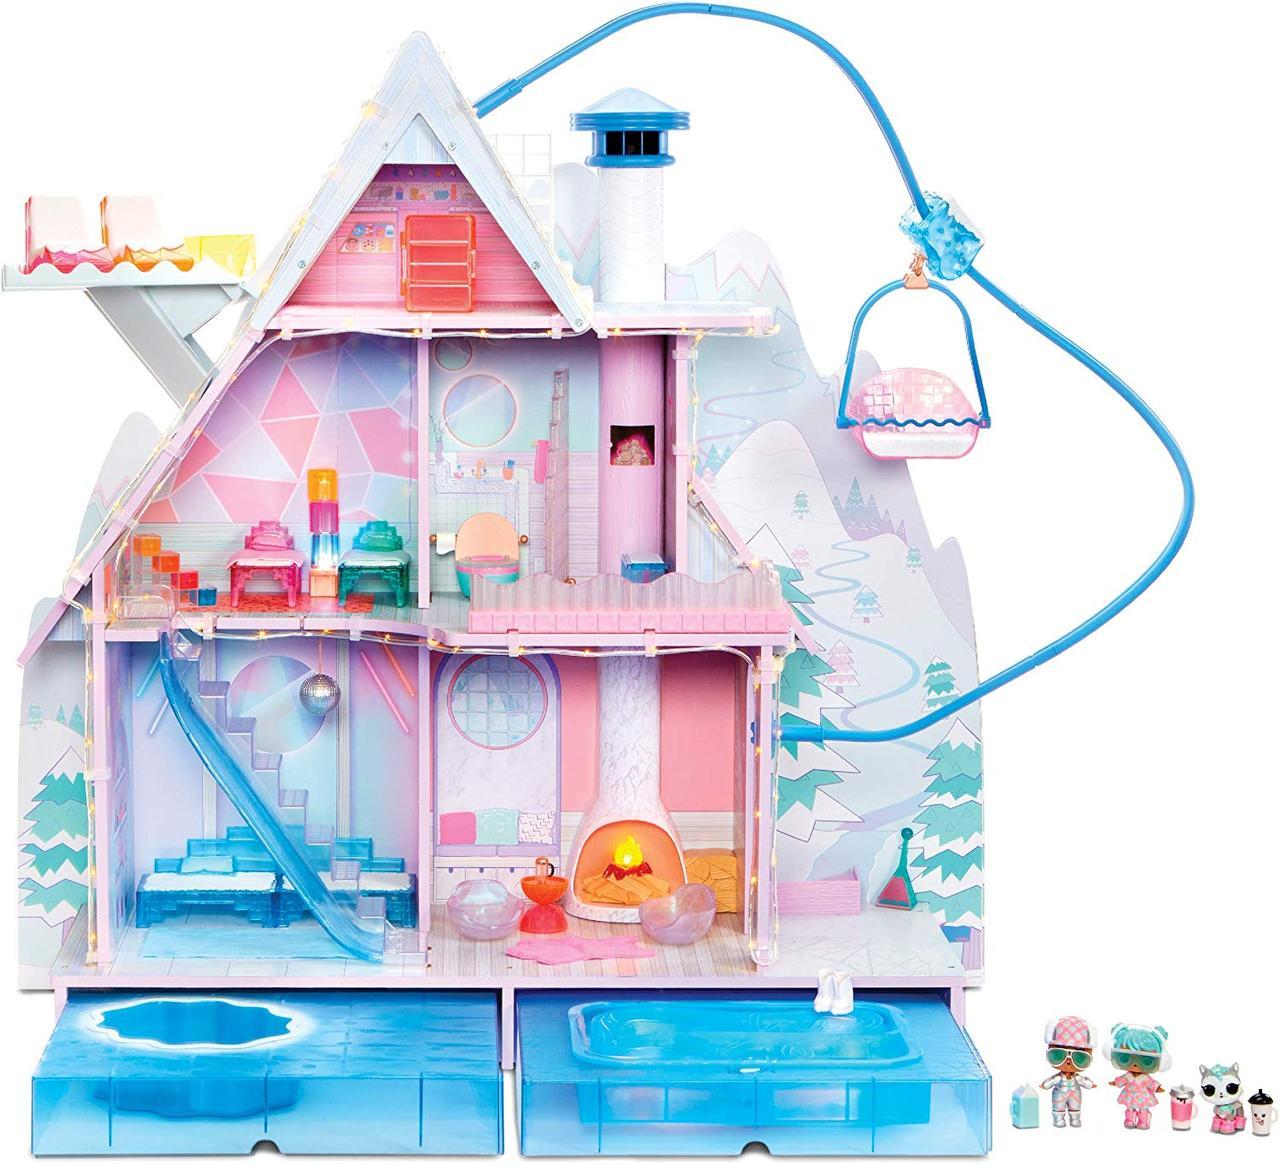 Дом ЛОЛ Зимний особняк для кукол Шале Зимнее диско L.O.L. Surprise! Winter Disco Chalet 95+